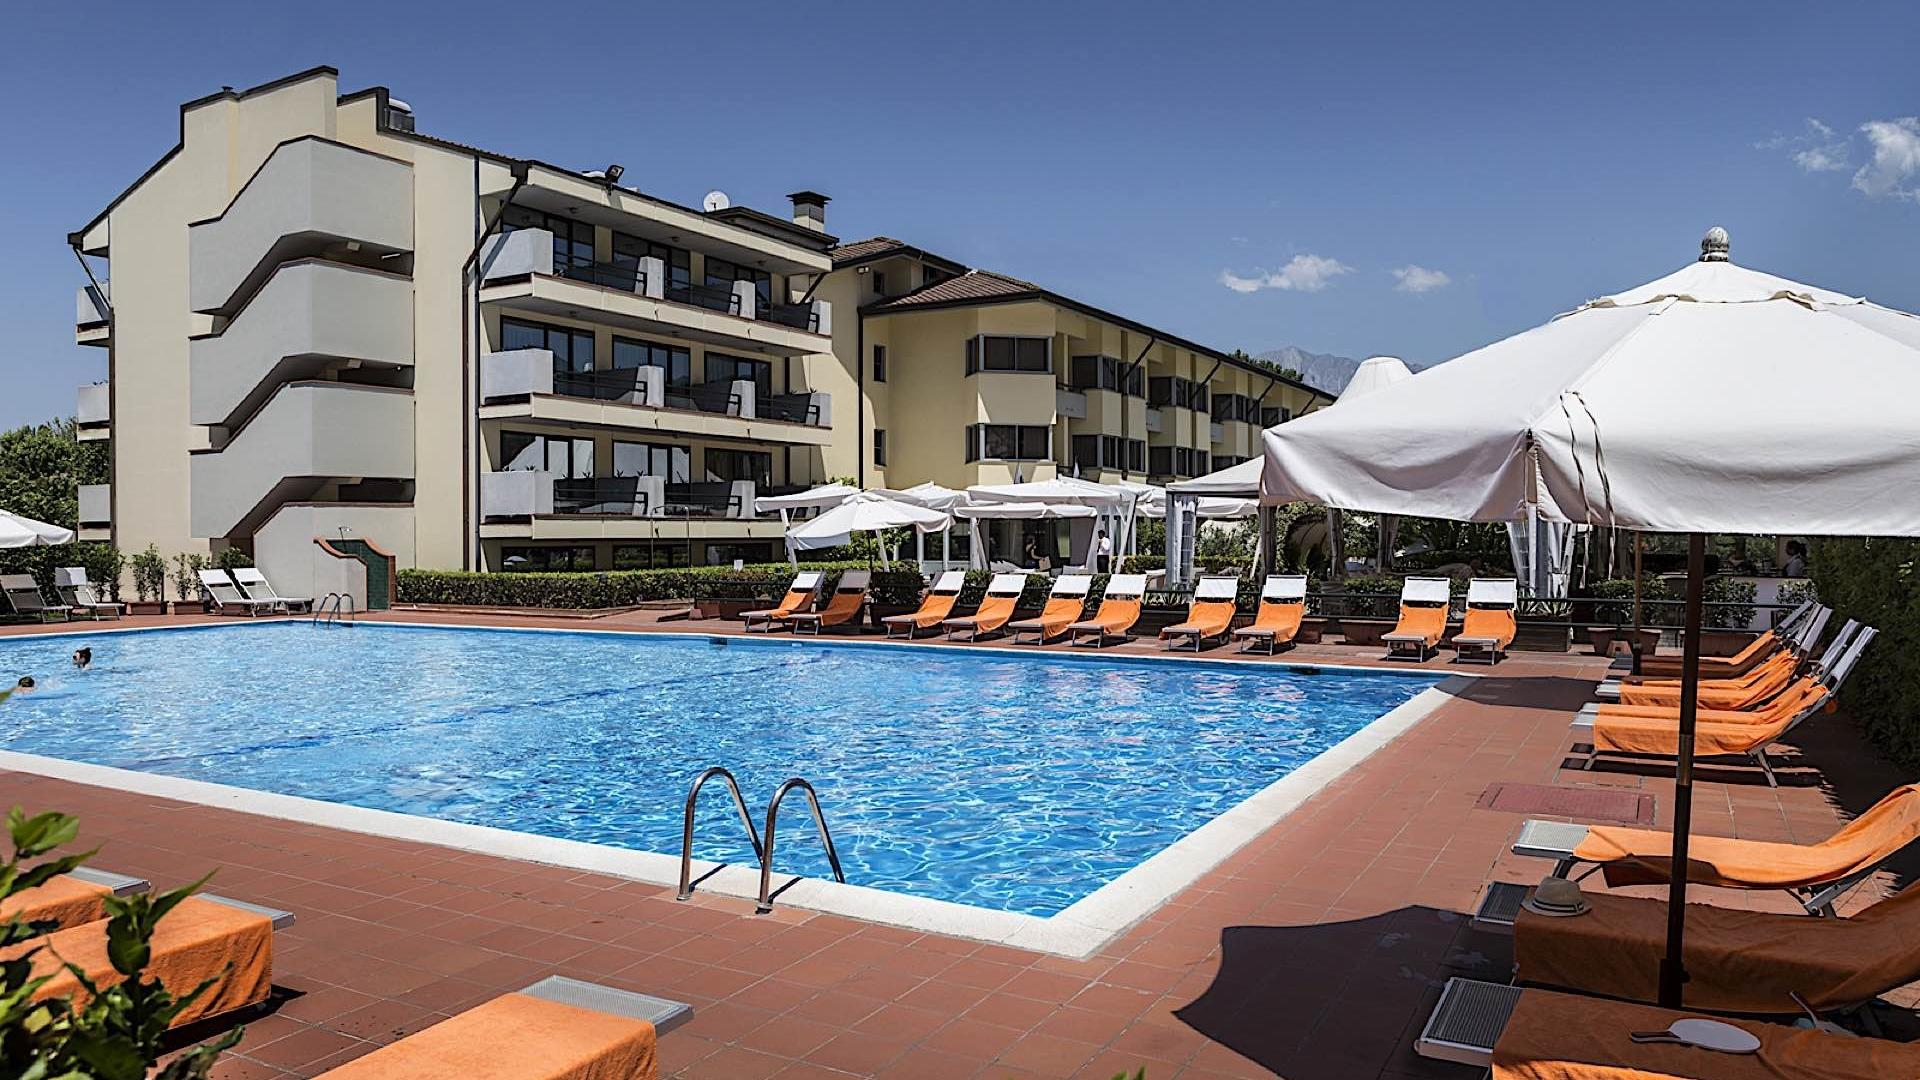 Pool View | Hotel Forte Dei Marmi